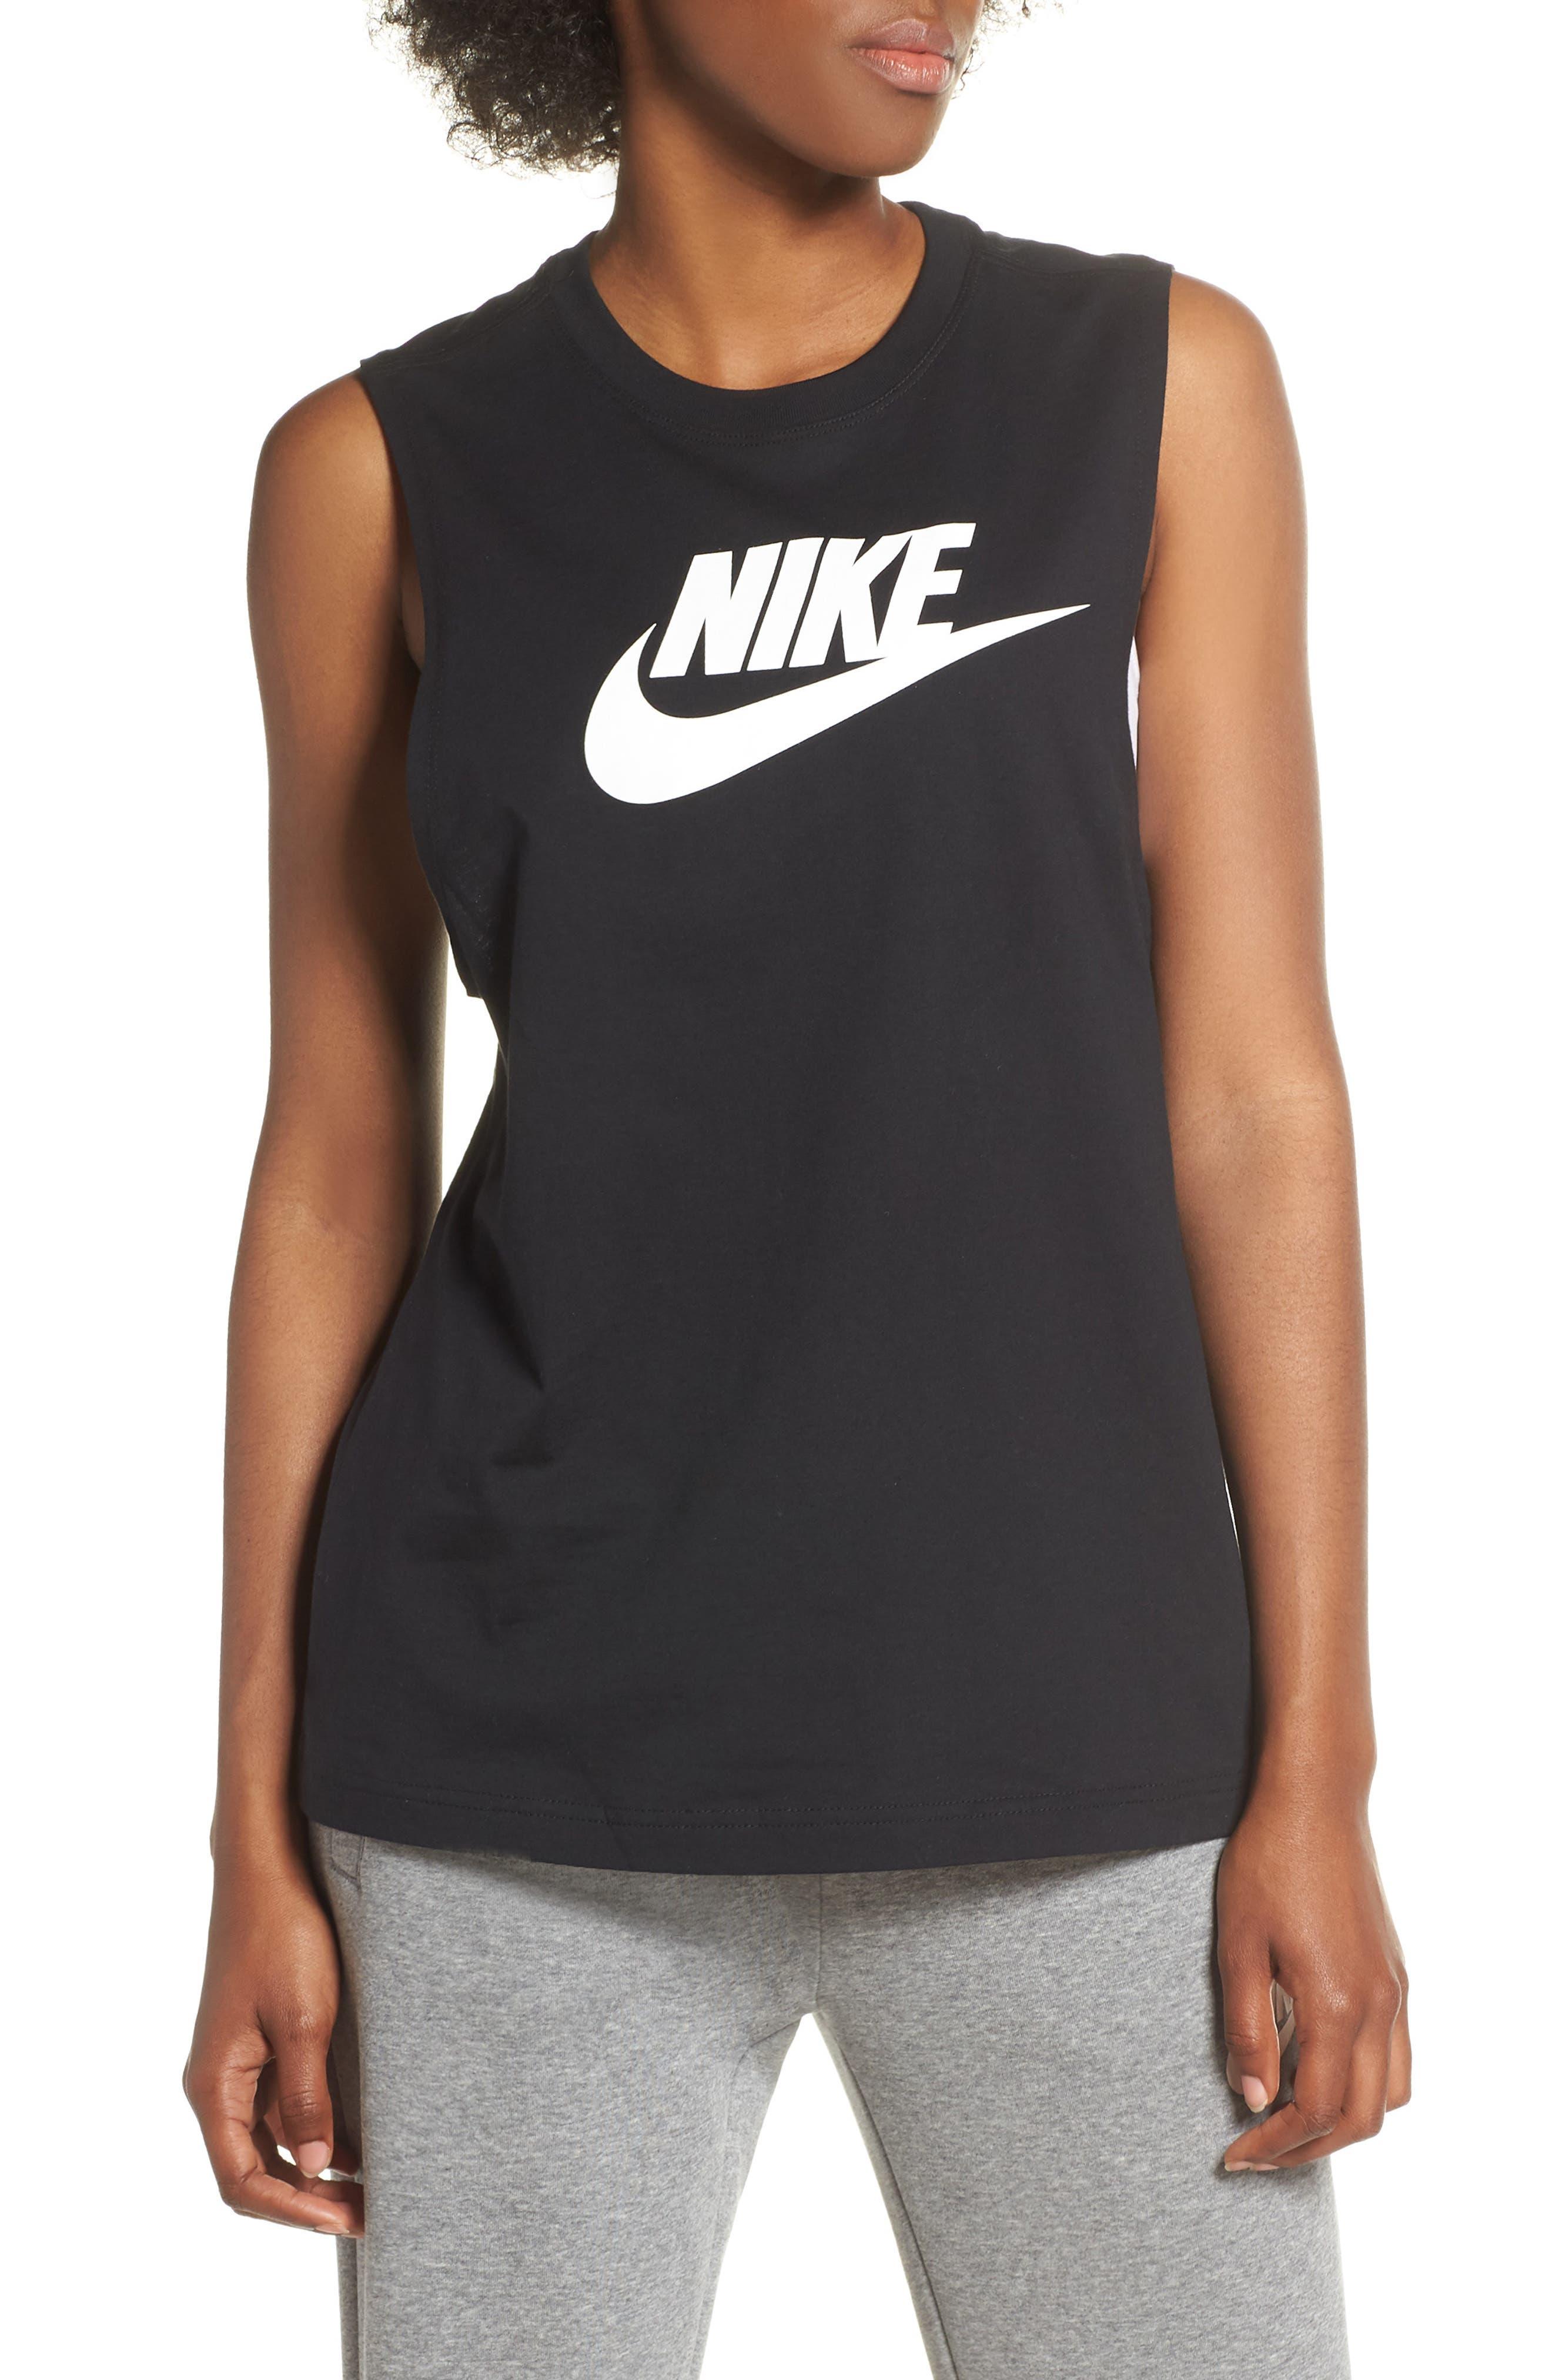 NIKE, Sportswear Essential Futura Muscle Tank, Main thumbnail 1, color, BLACK/ WHITE